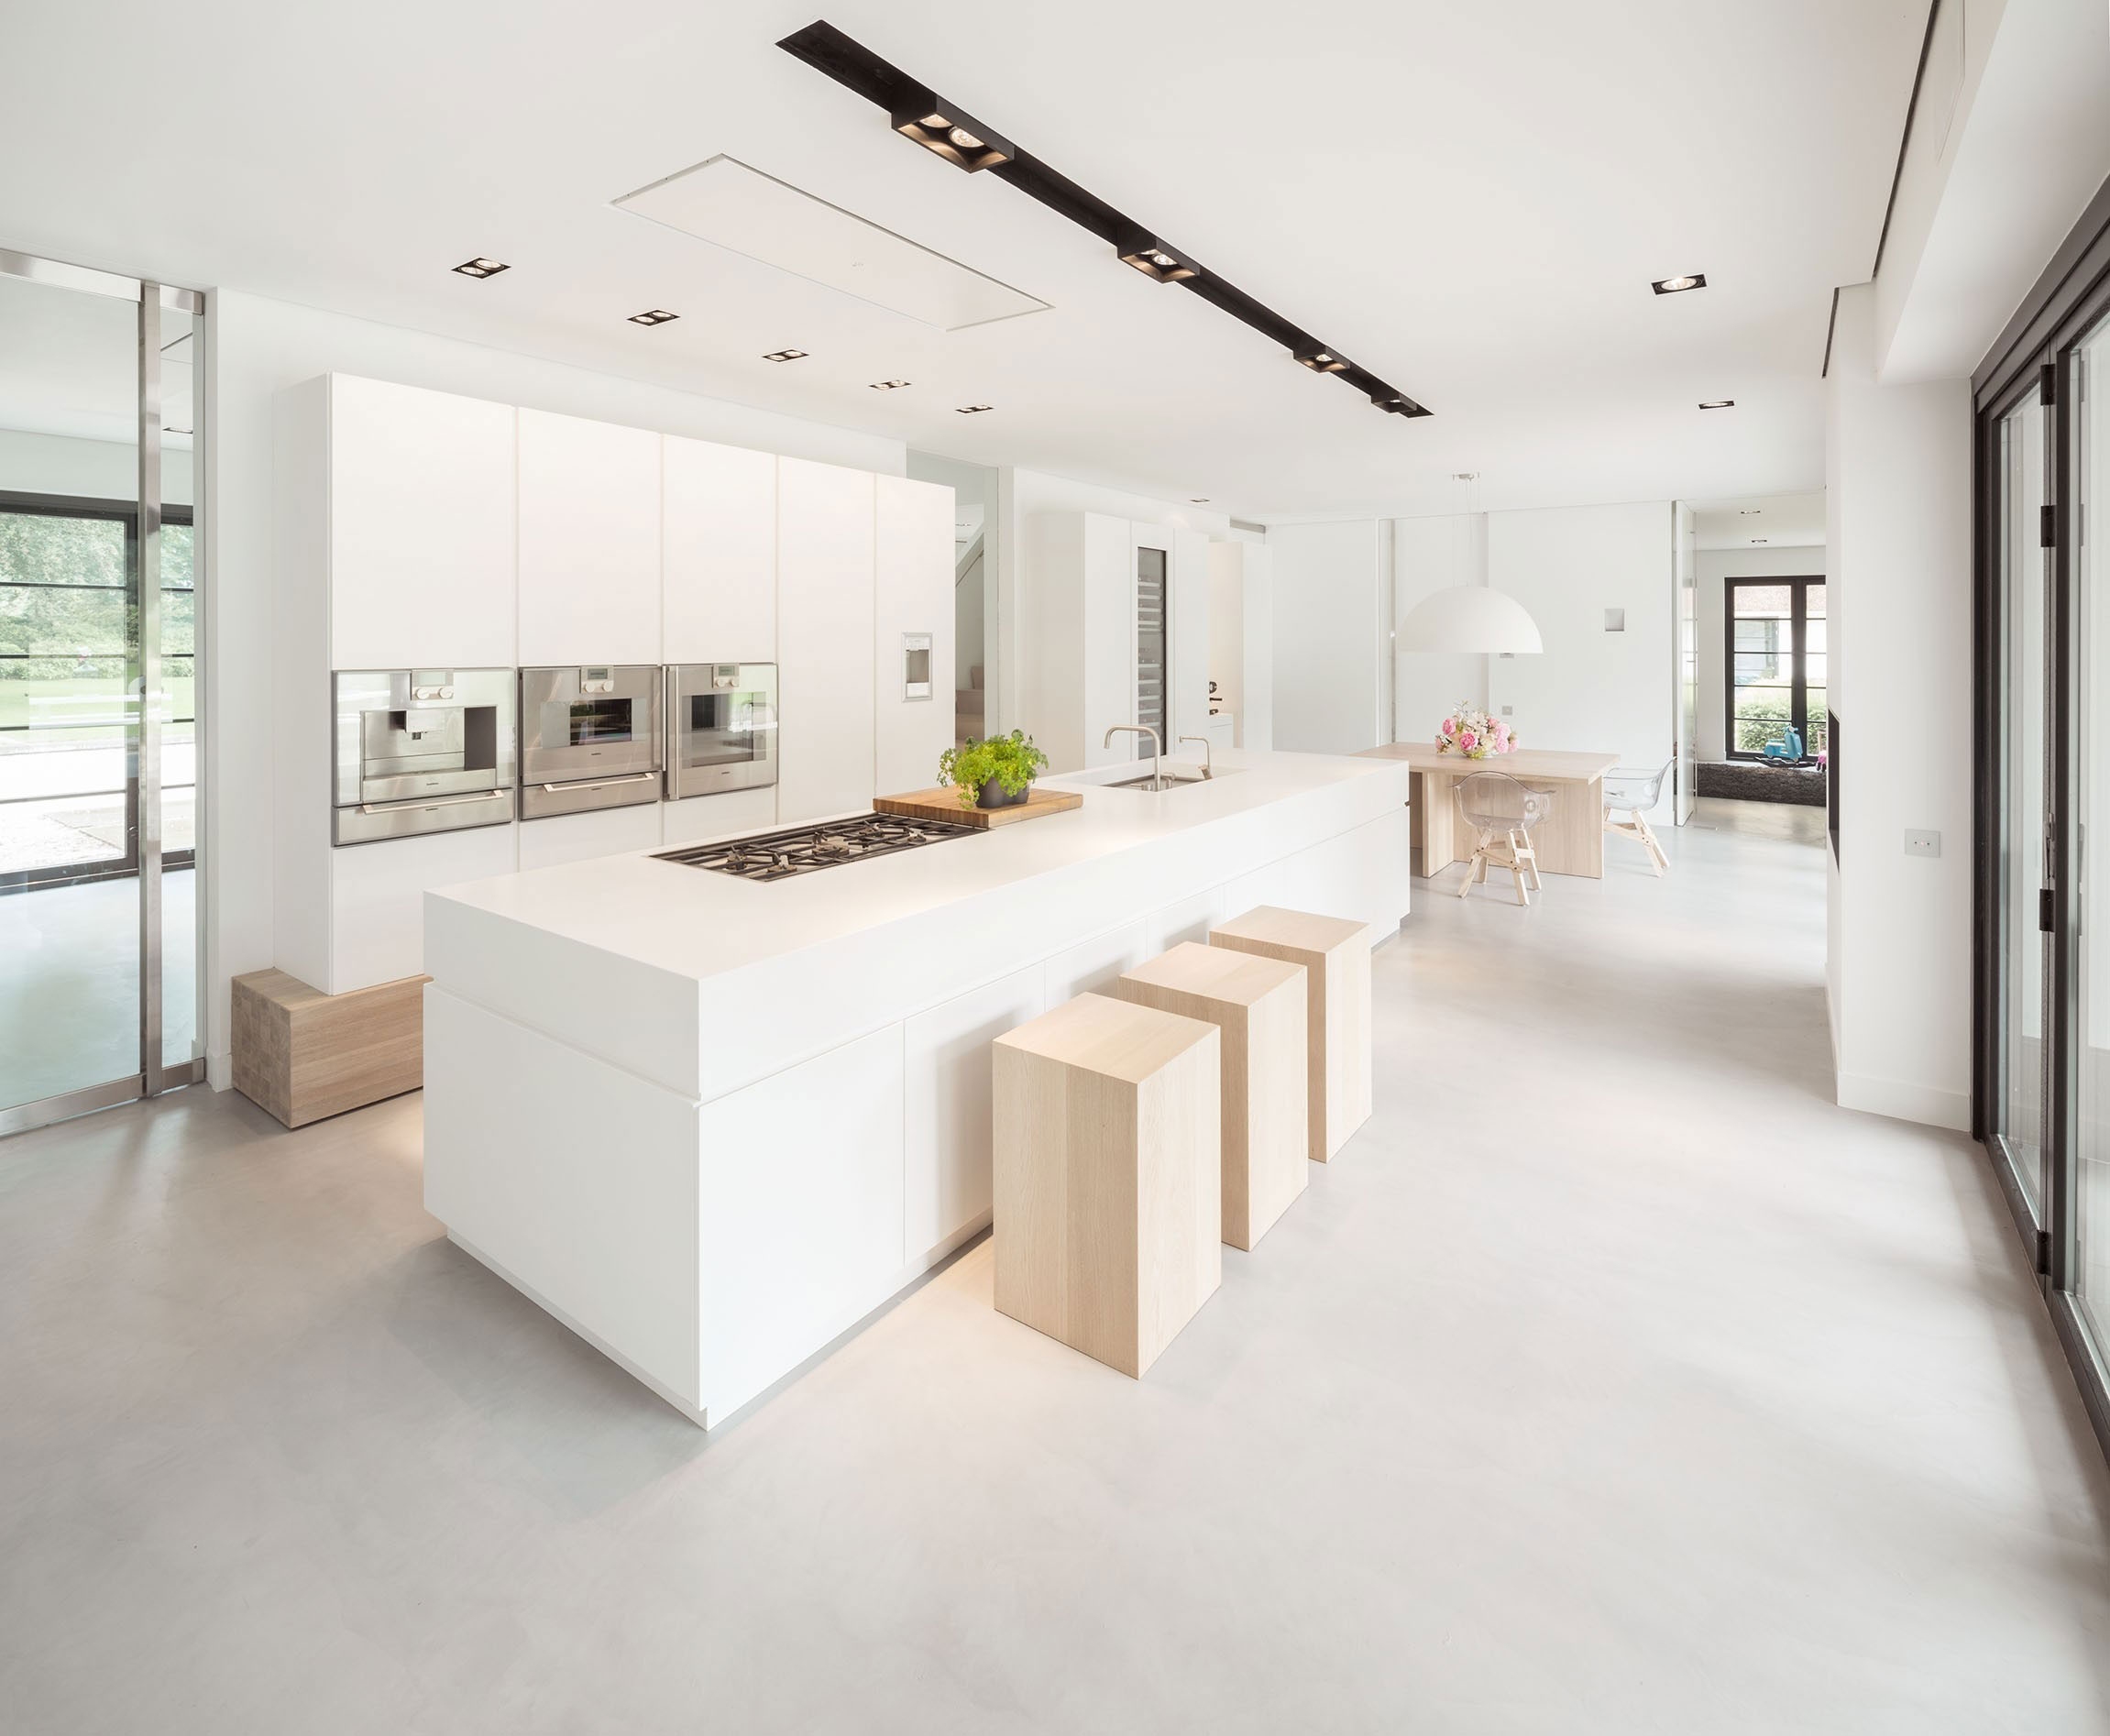 Modern Huizen Country House Located in a Quiet Rural Setting by De Brouwer Binnenwerk-08